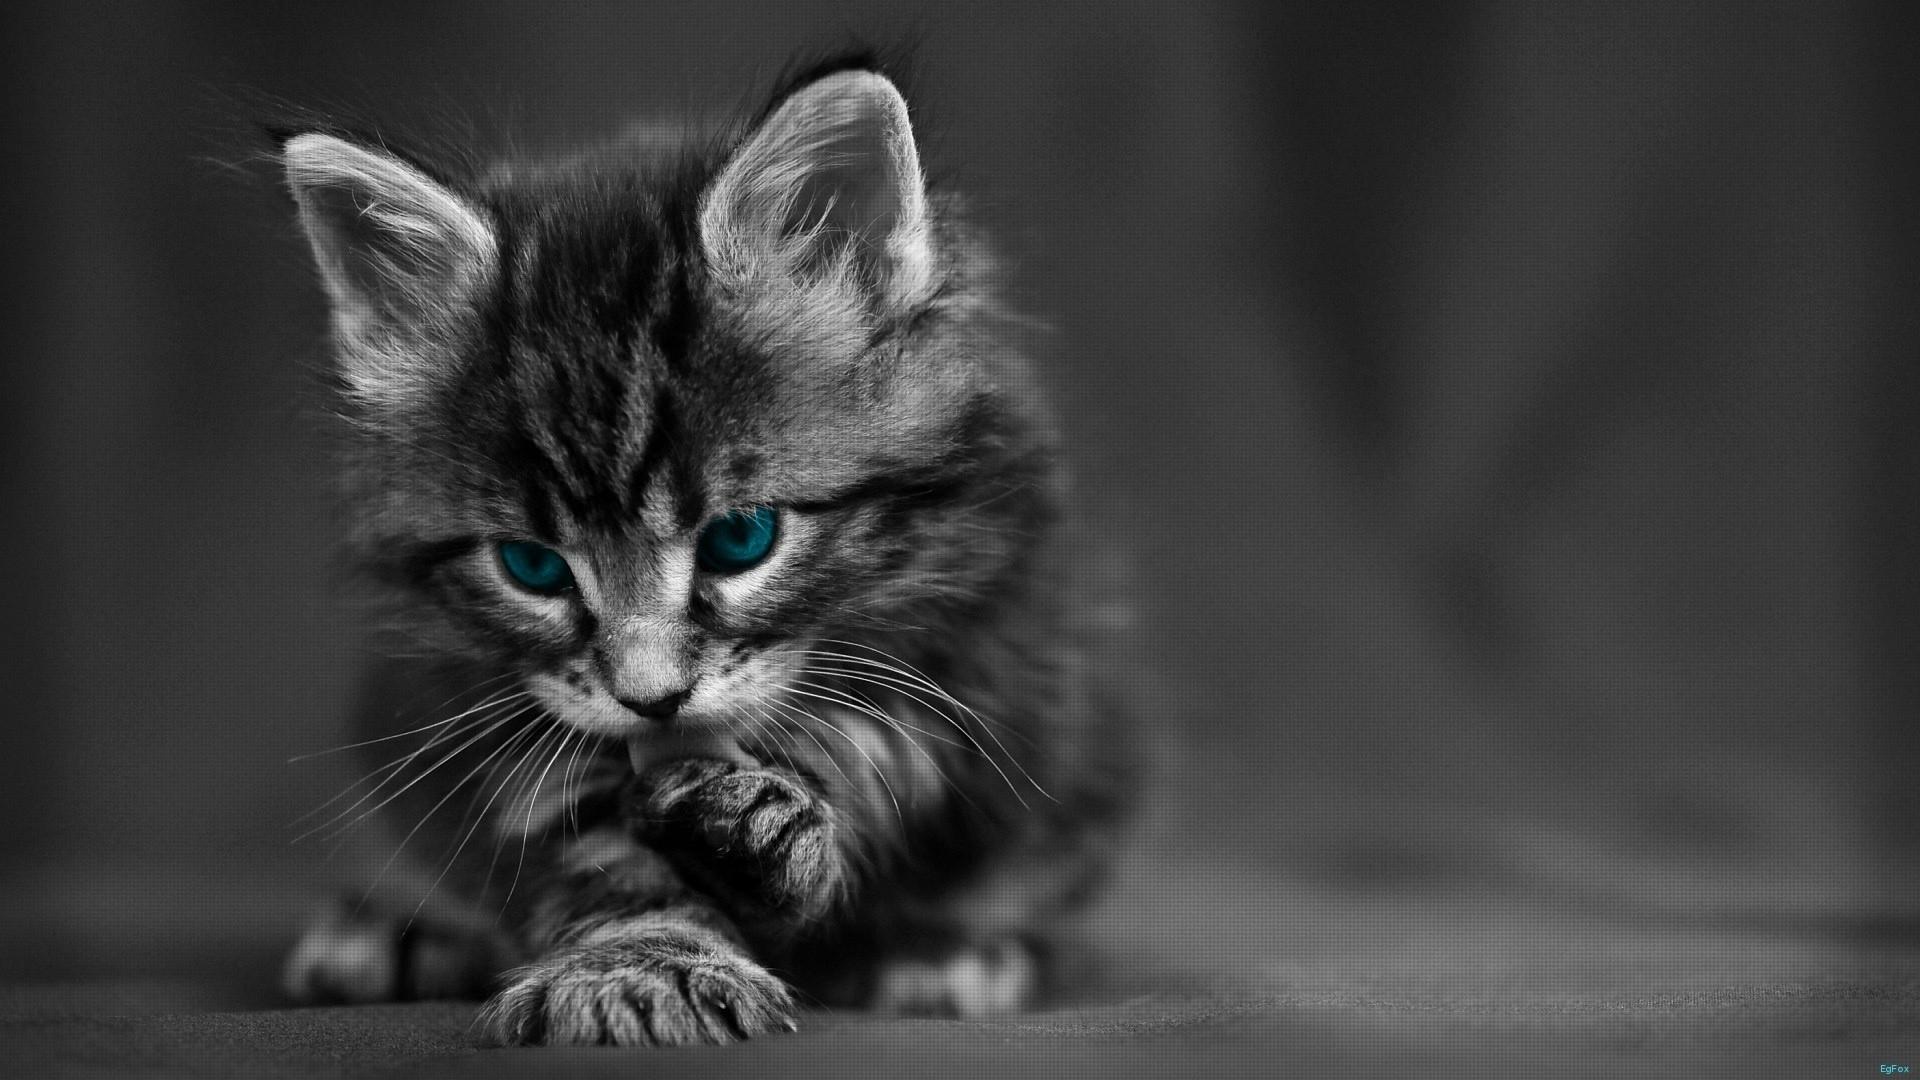 Cute Cat Black And White 1920x1080 Wallpaper Teahub Io